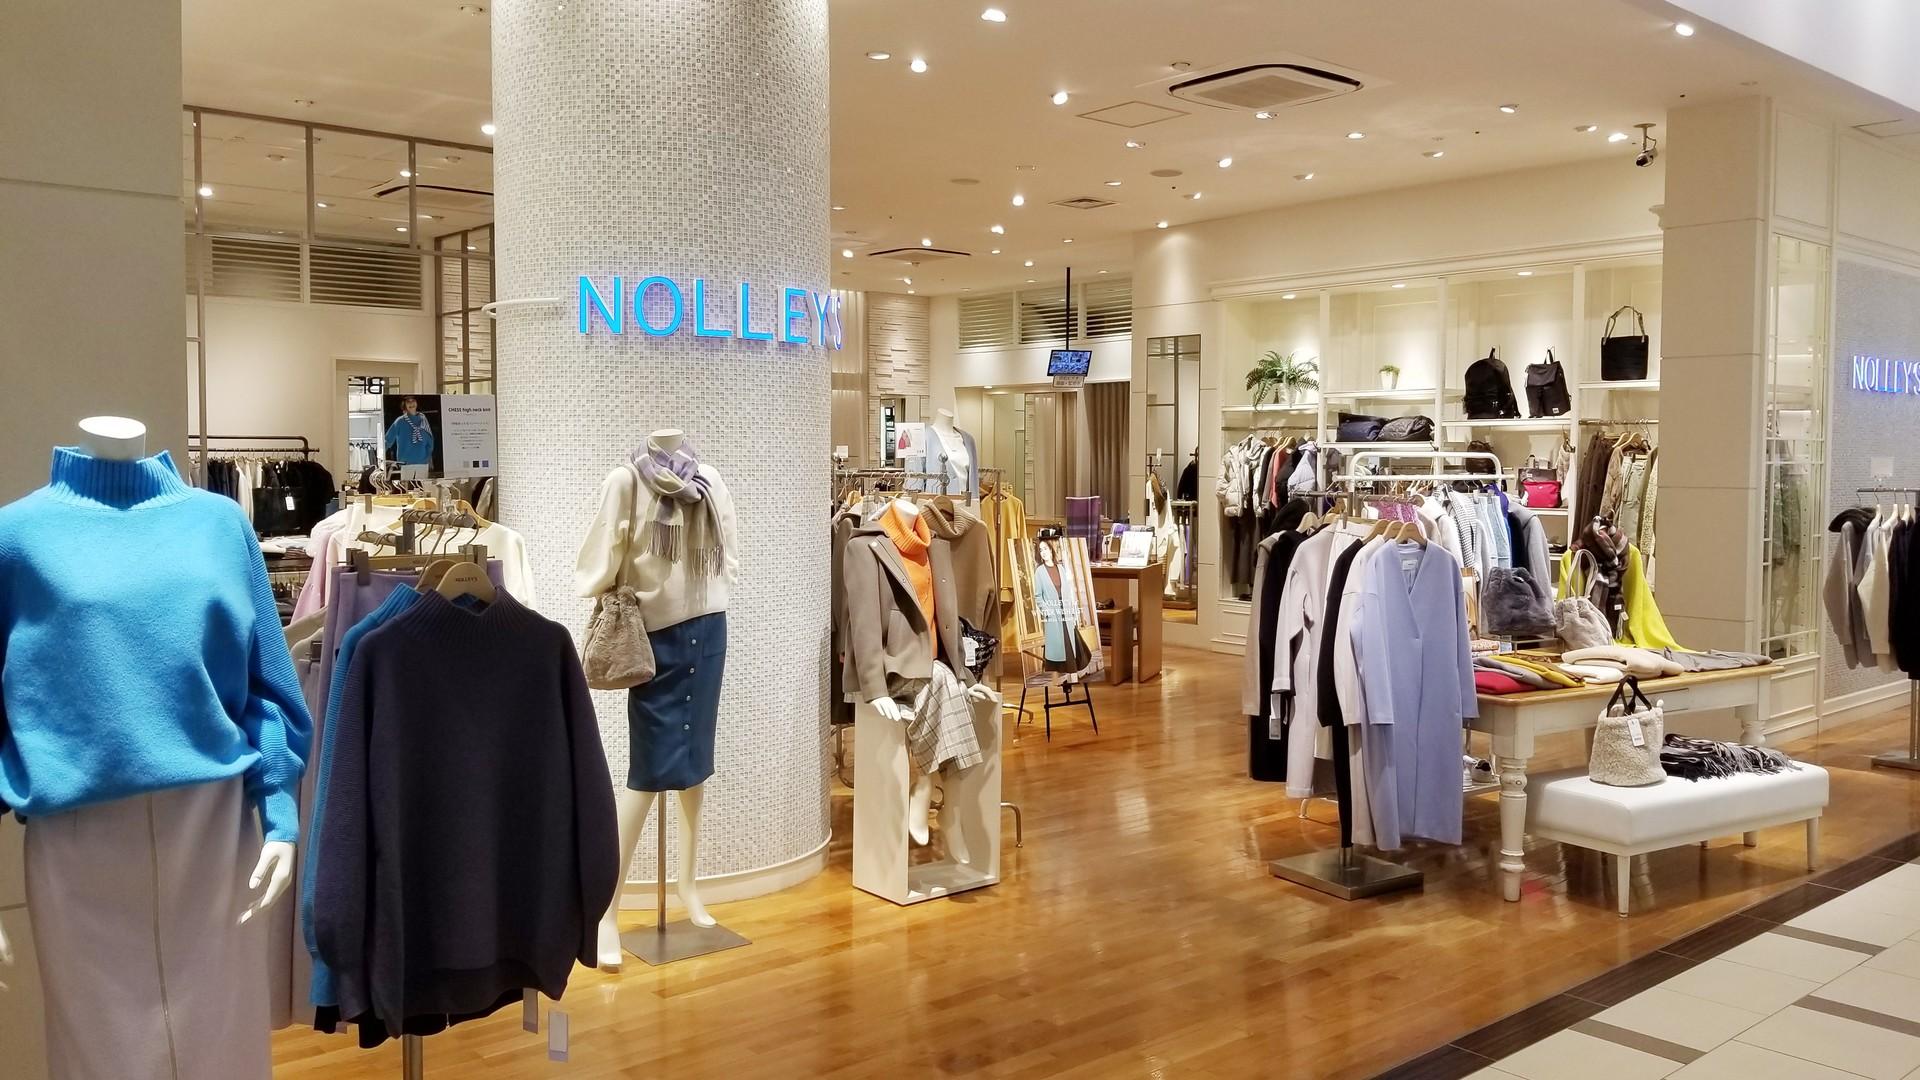 【NOLLEY'S】未経験歓迎の販売員の募集です!|正社員のカバー写真